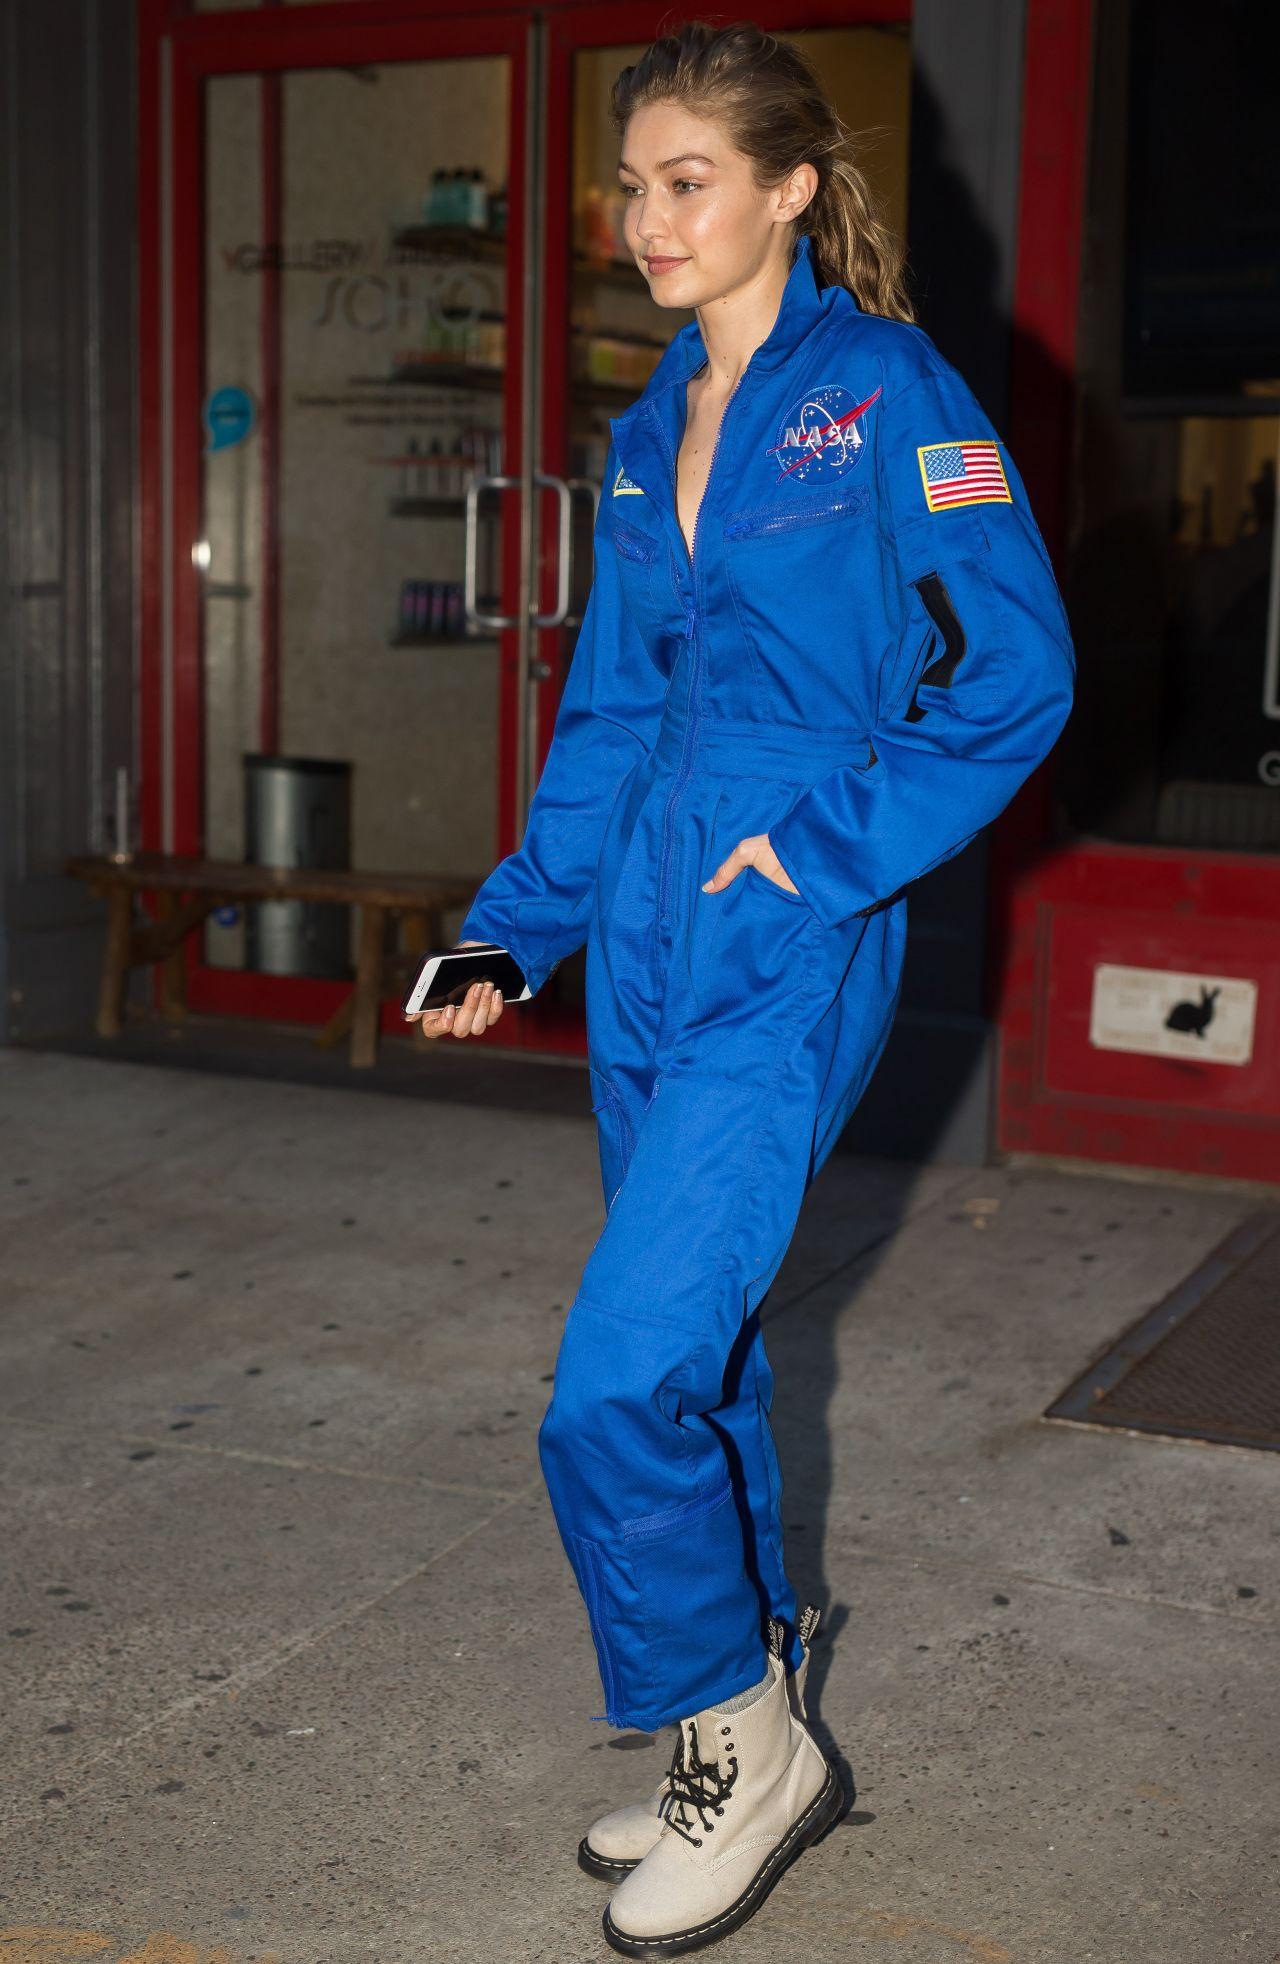 Gigi Hadid in a Blue NASA Jumpsuit  NYC 10252017